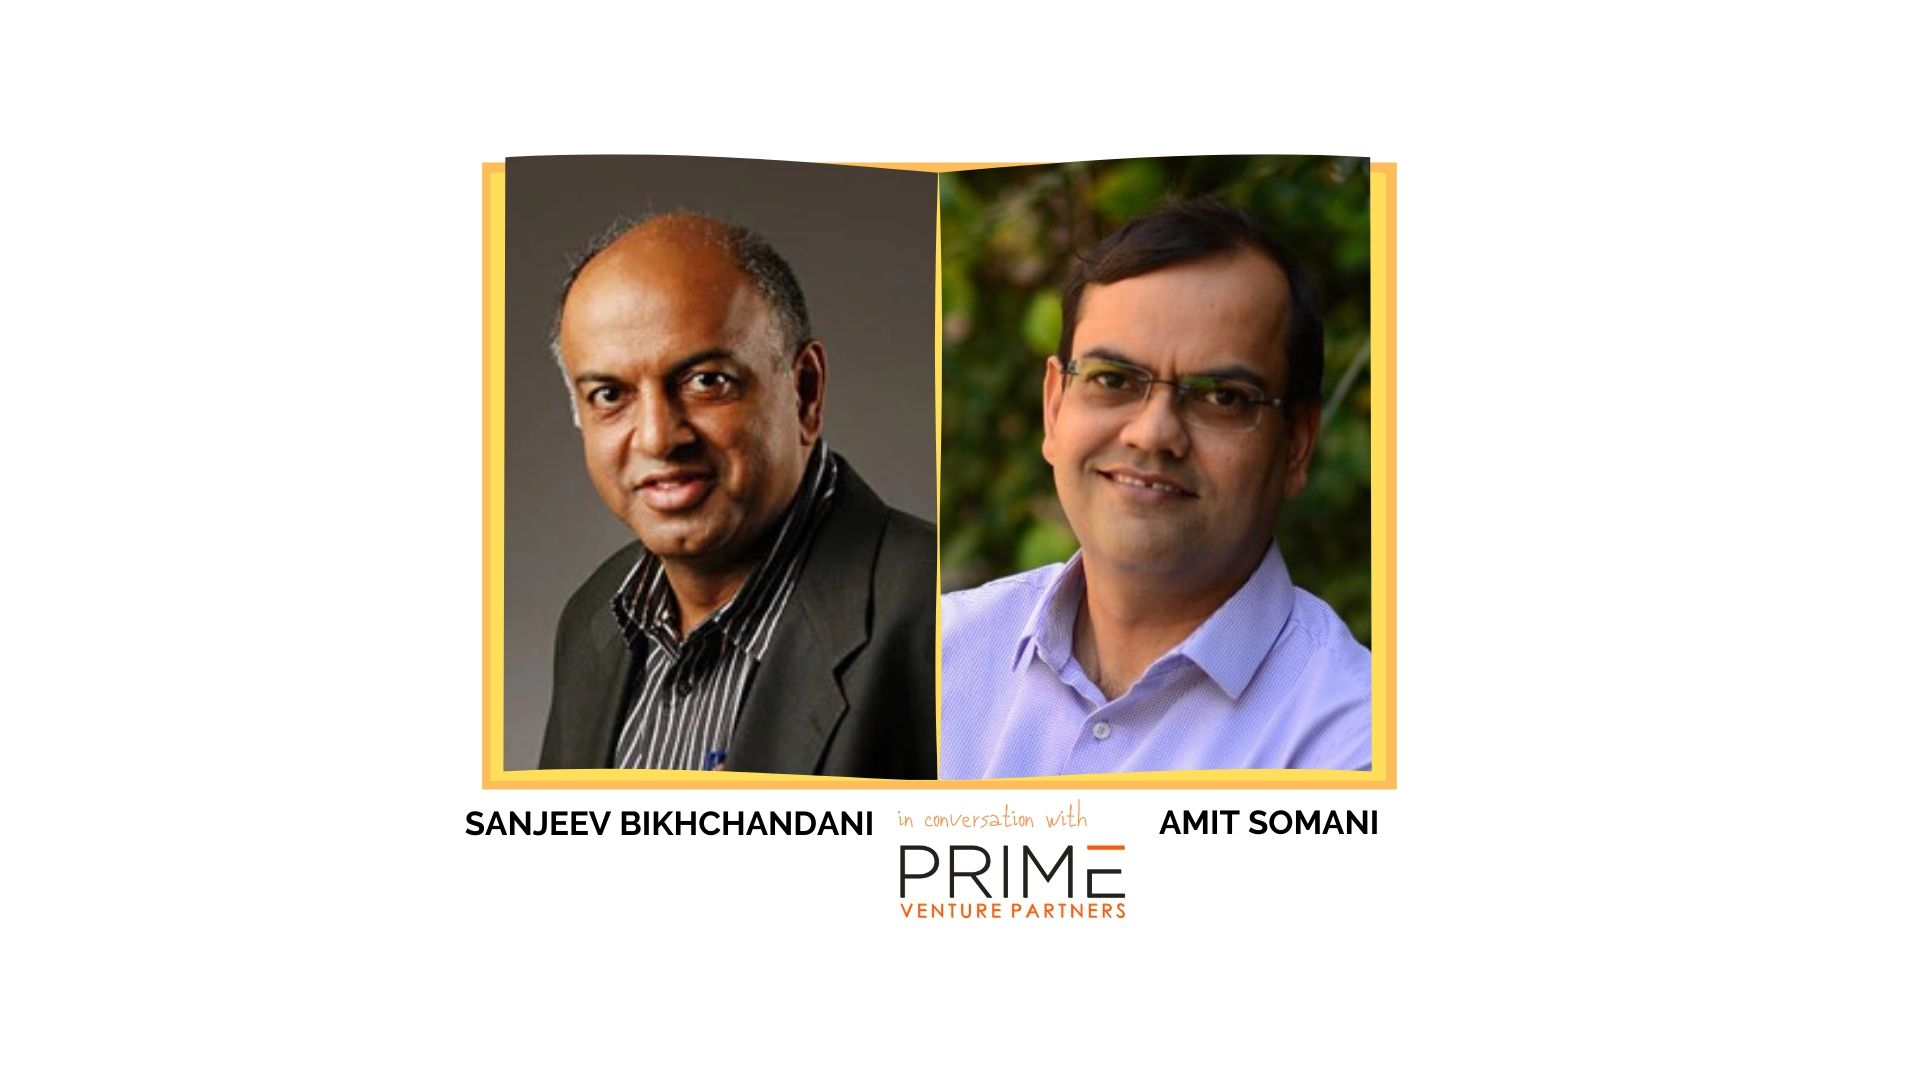 Sanjeev Bikhchandani, Co-Founder Naukri (Infoedge Group), on Customers, Innovation & Entrepreneurship